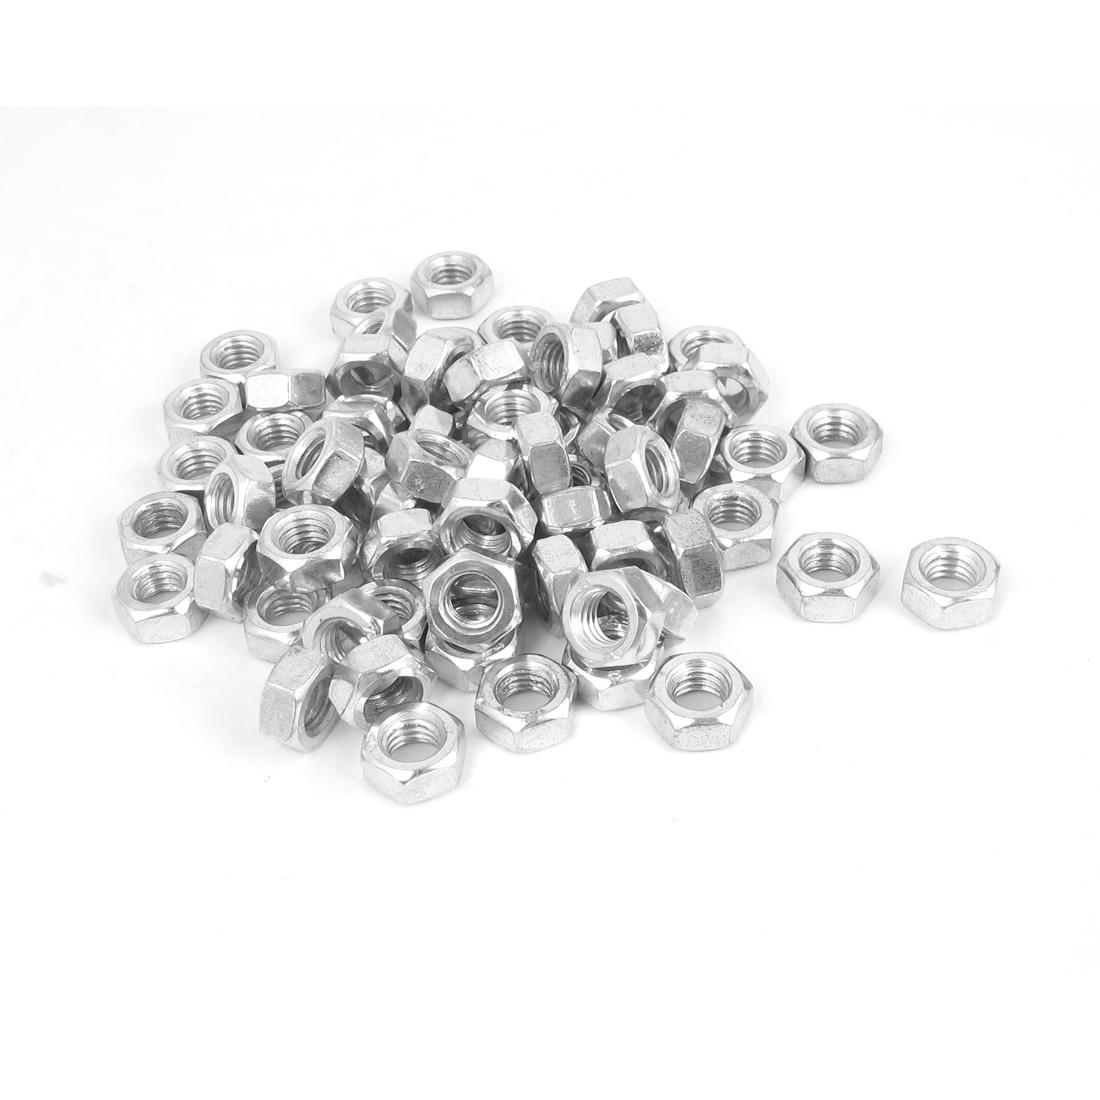 6mm Thread Dia Electric Machine Fastener Metal Screws Hex Nut Silver Tone 120Pcs